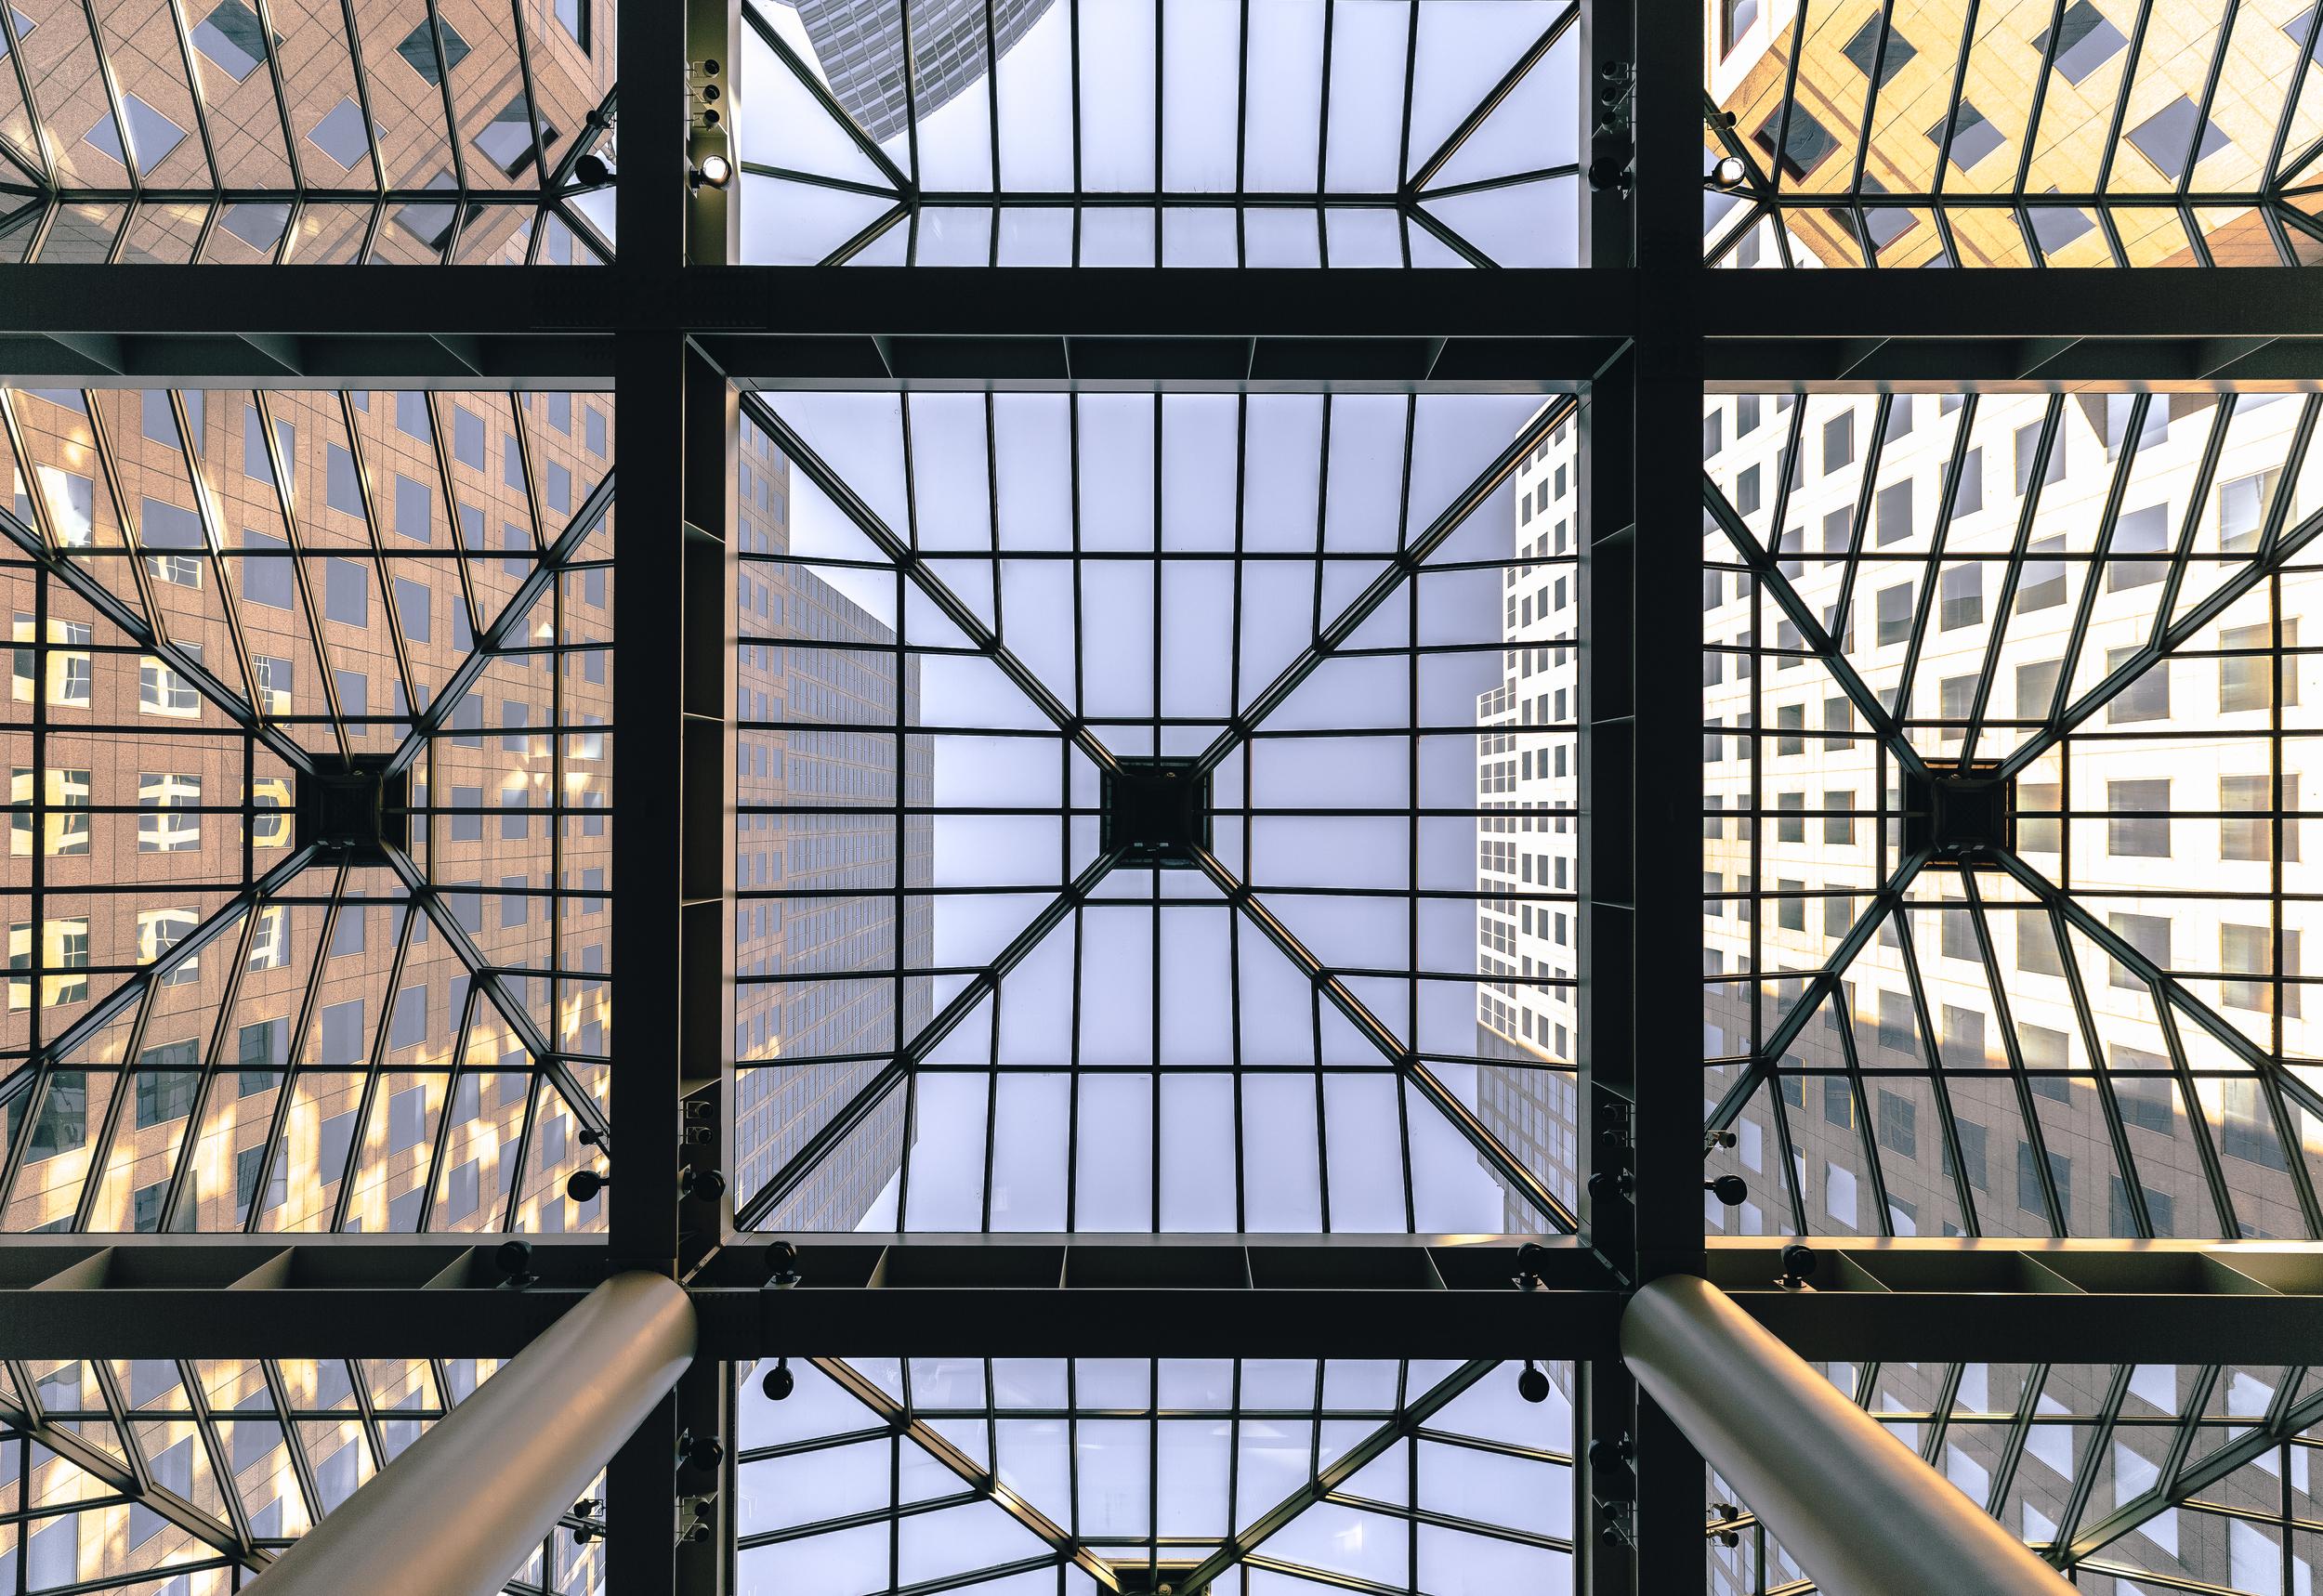 NYC Look Up Indoors_.jpg